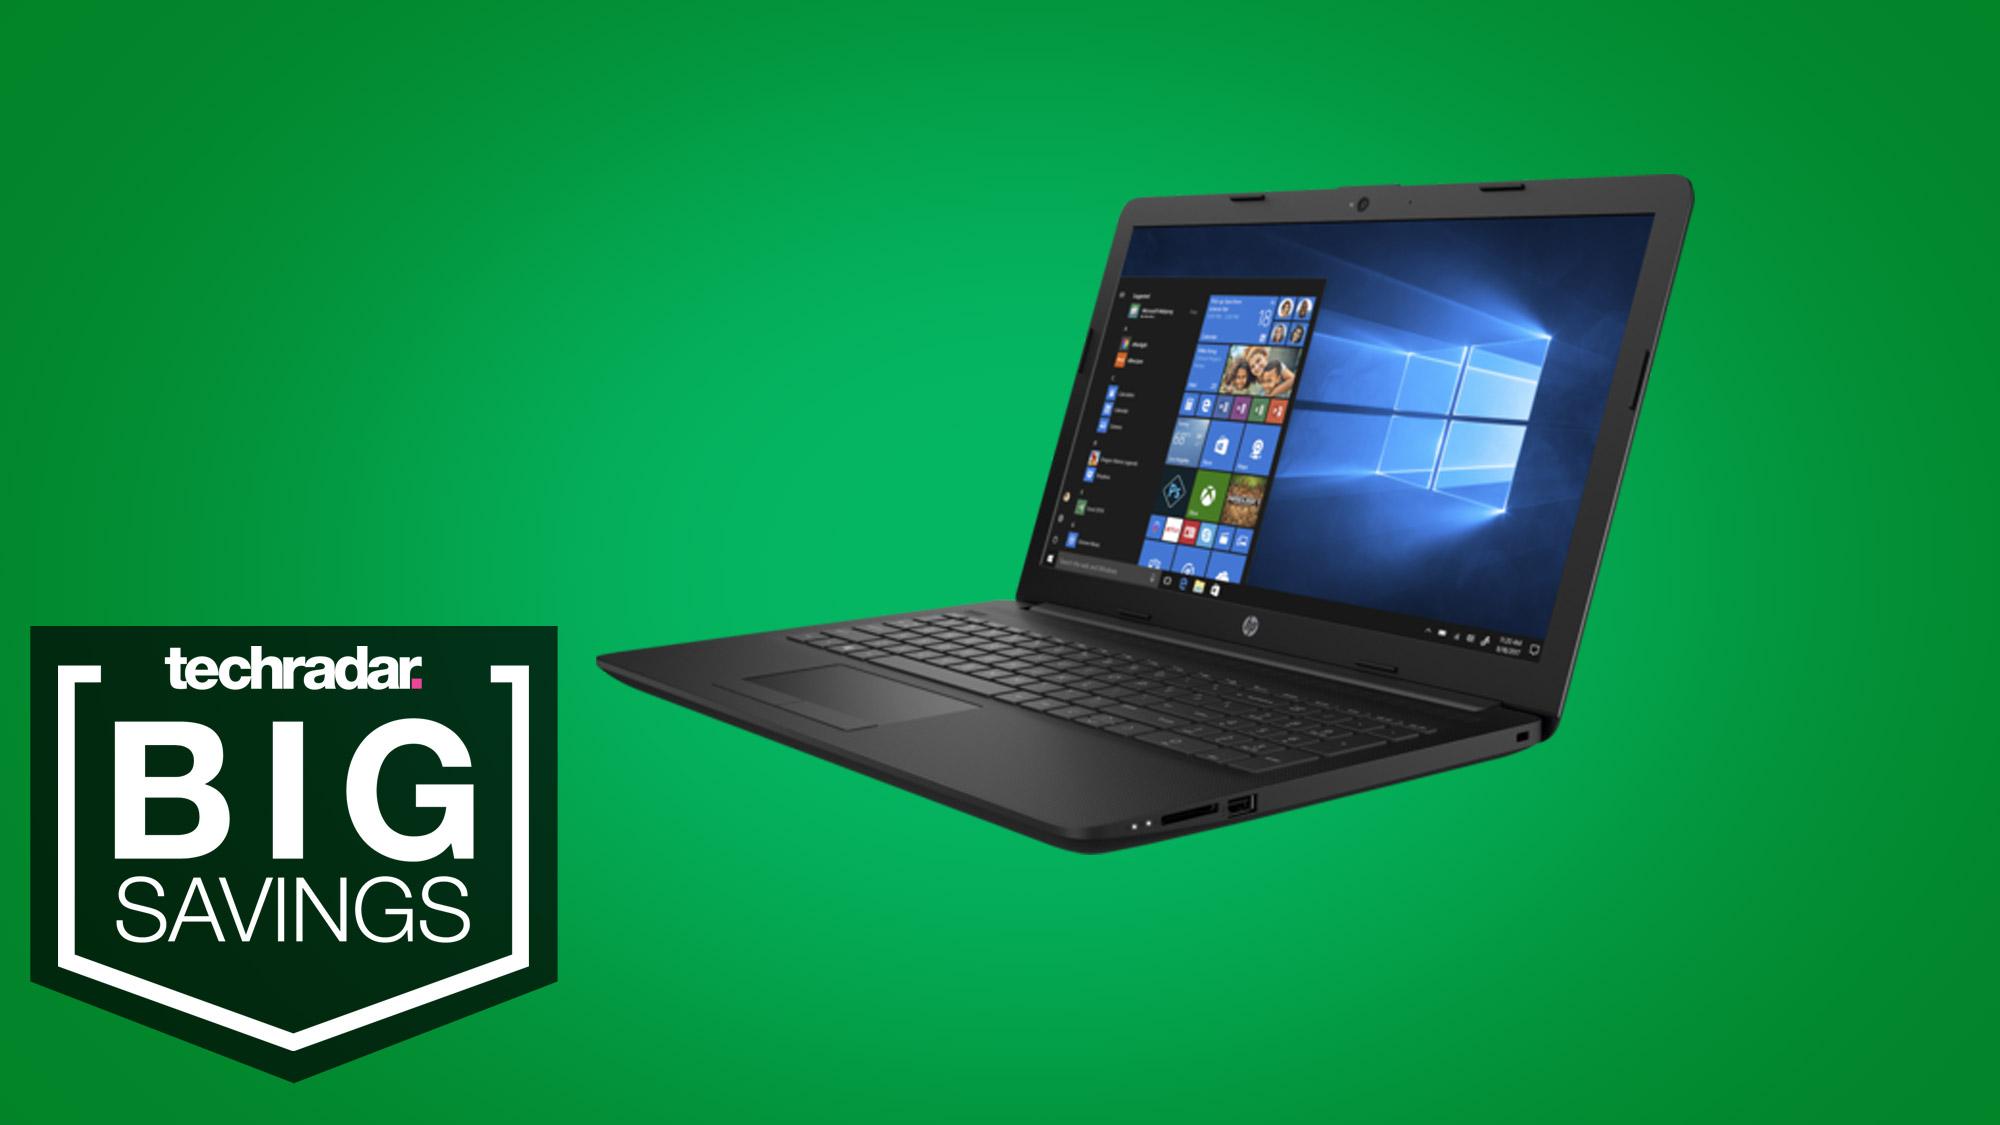 HP laptop sale: the HP laptop 15t gets a massive $770 price cut